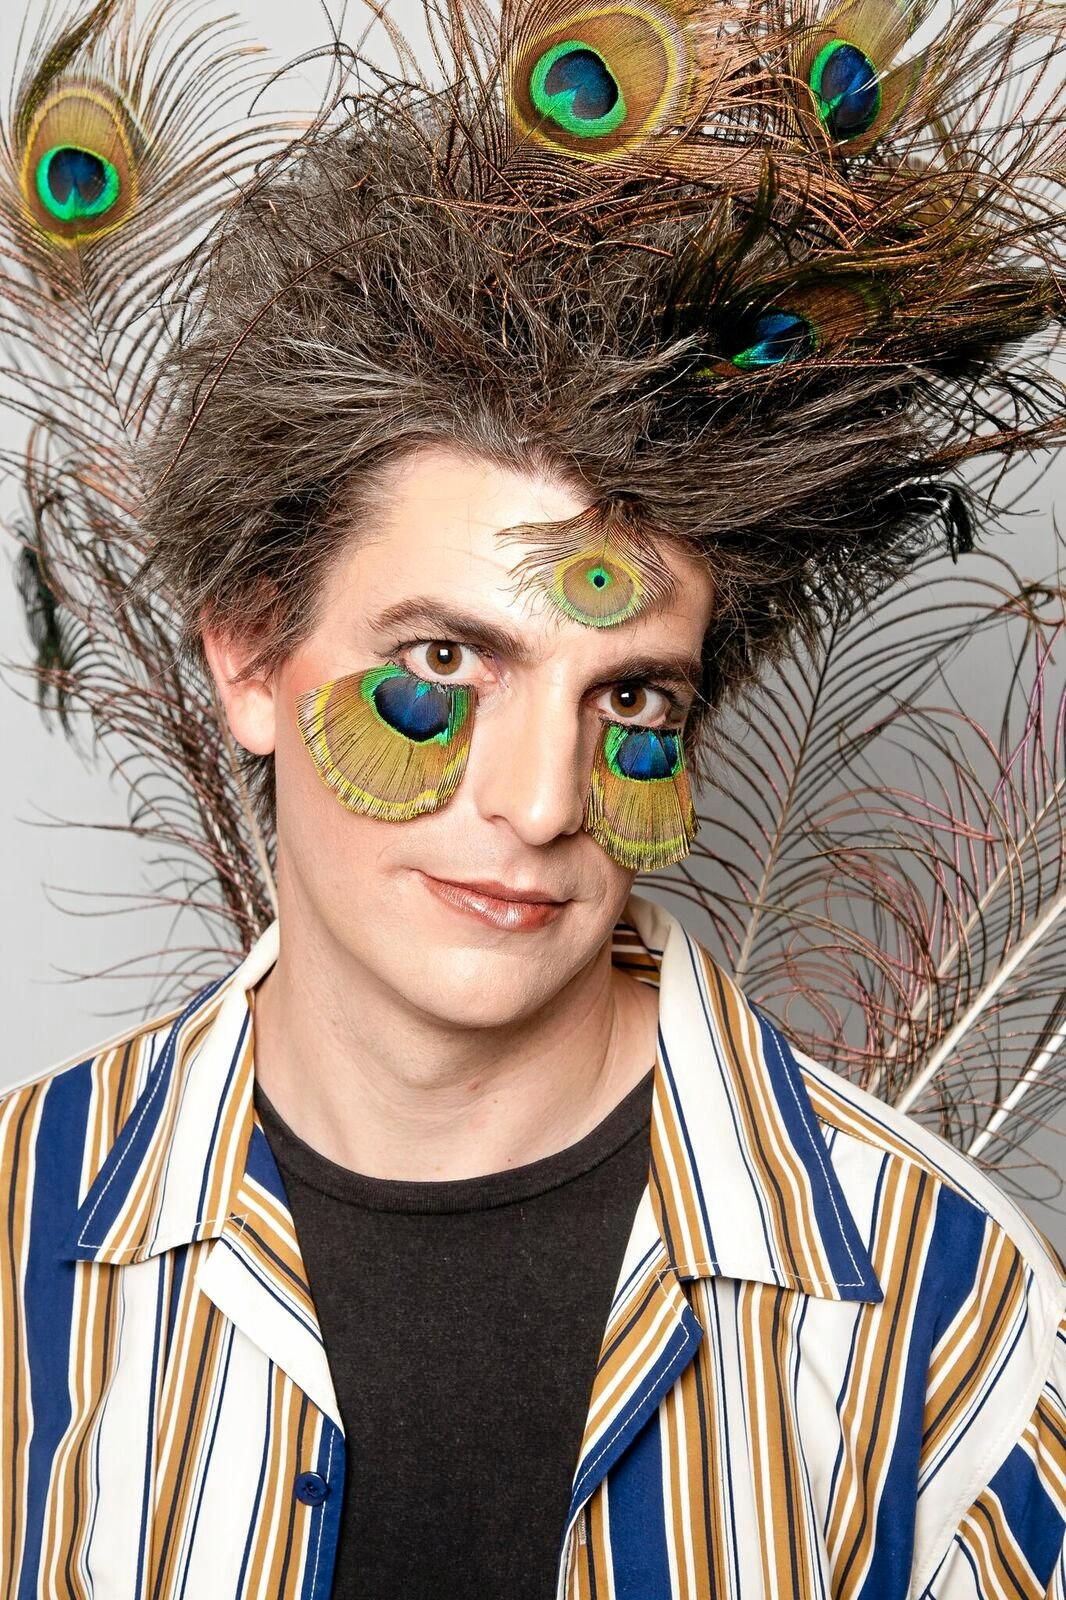 Matthew Noffke, make up by Jade Reese.